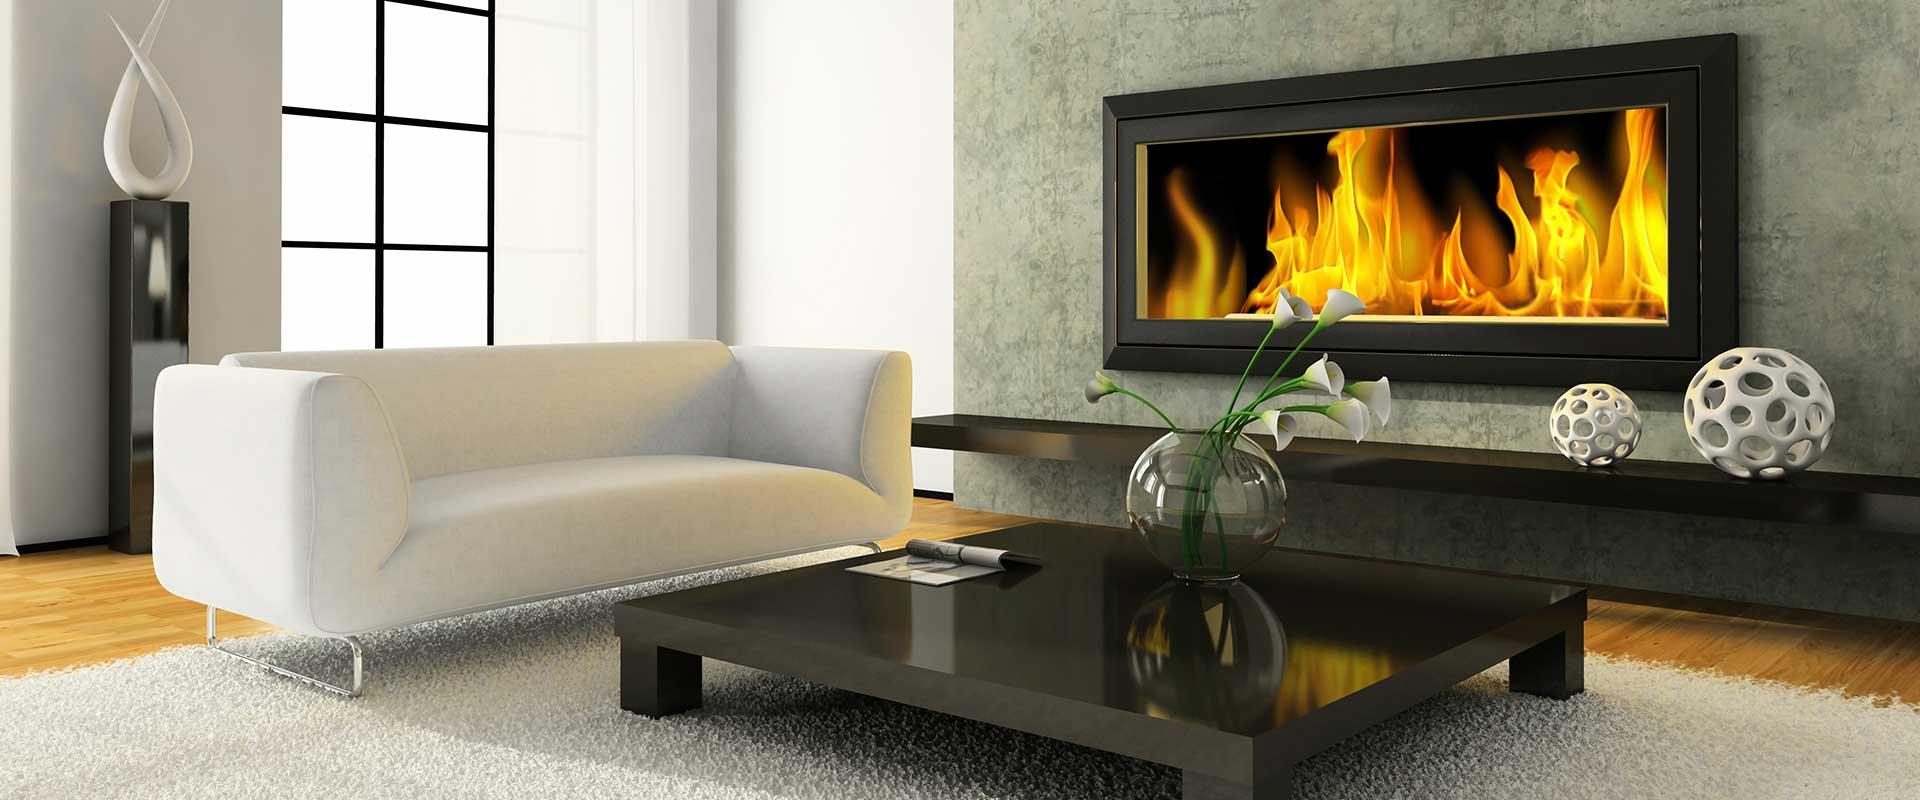 firepalce-installation2